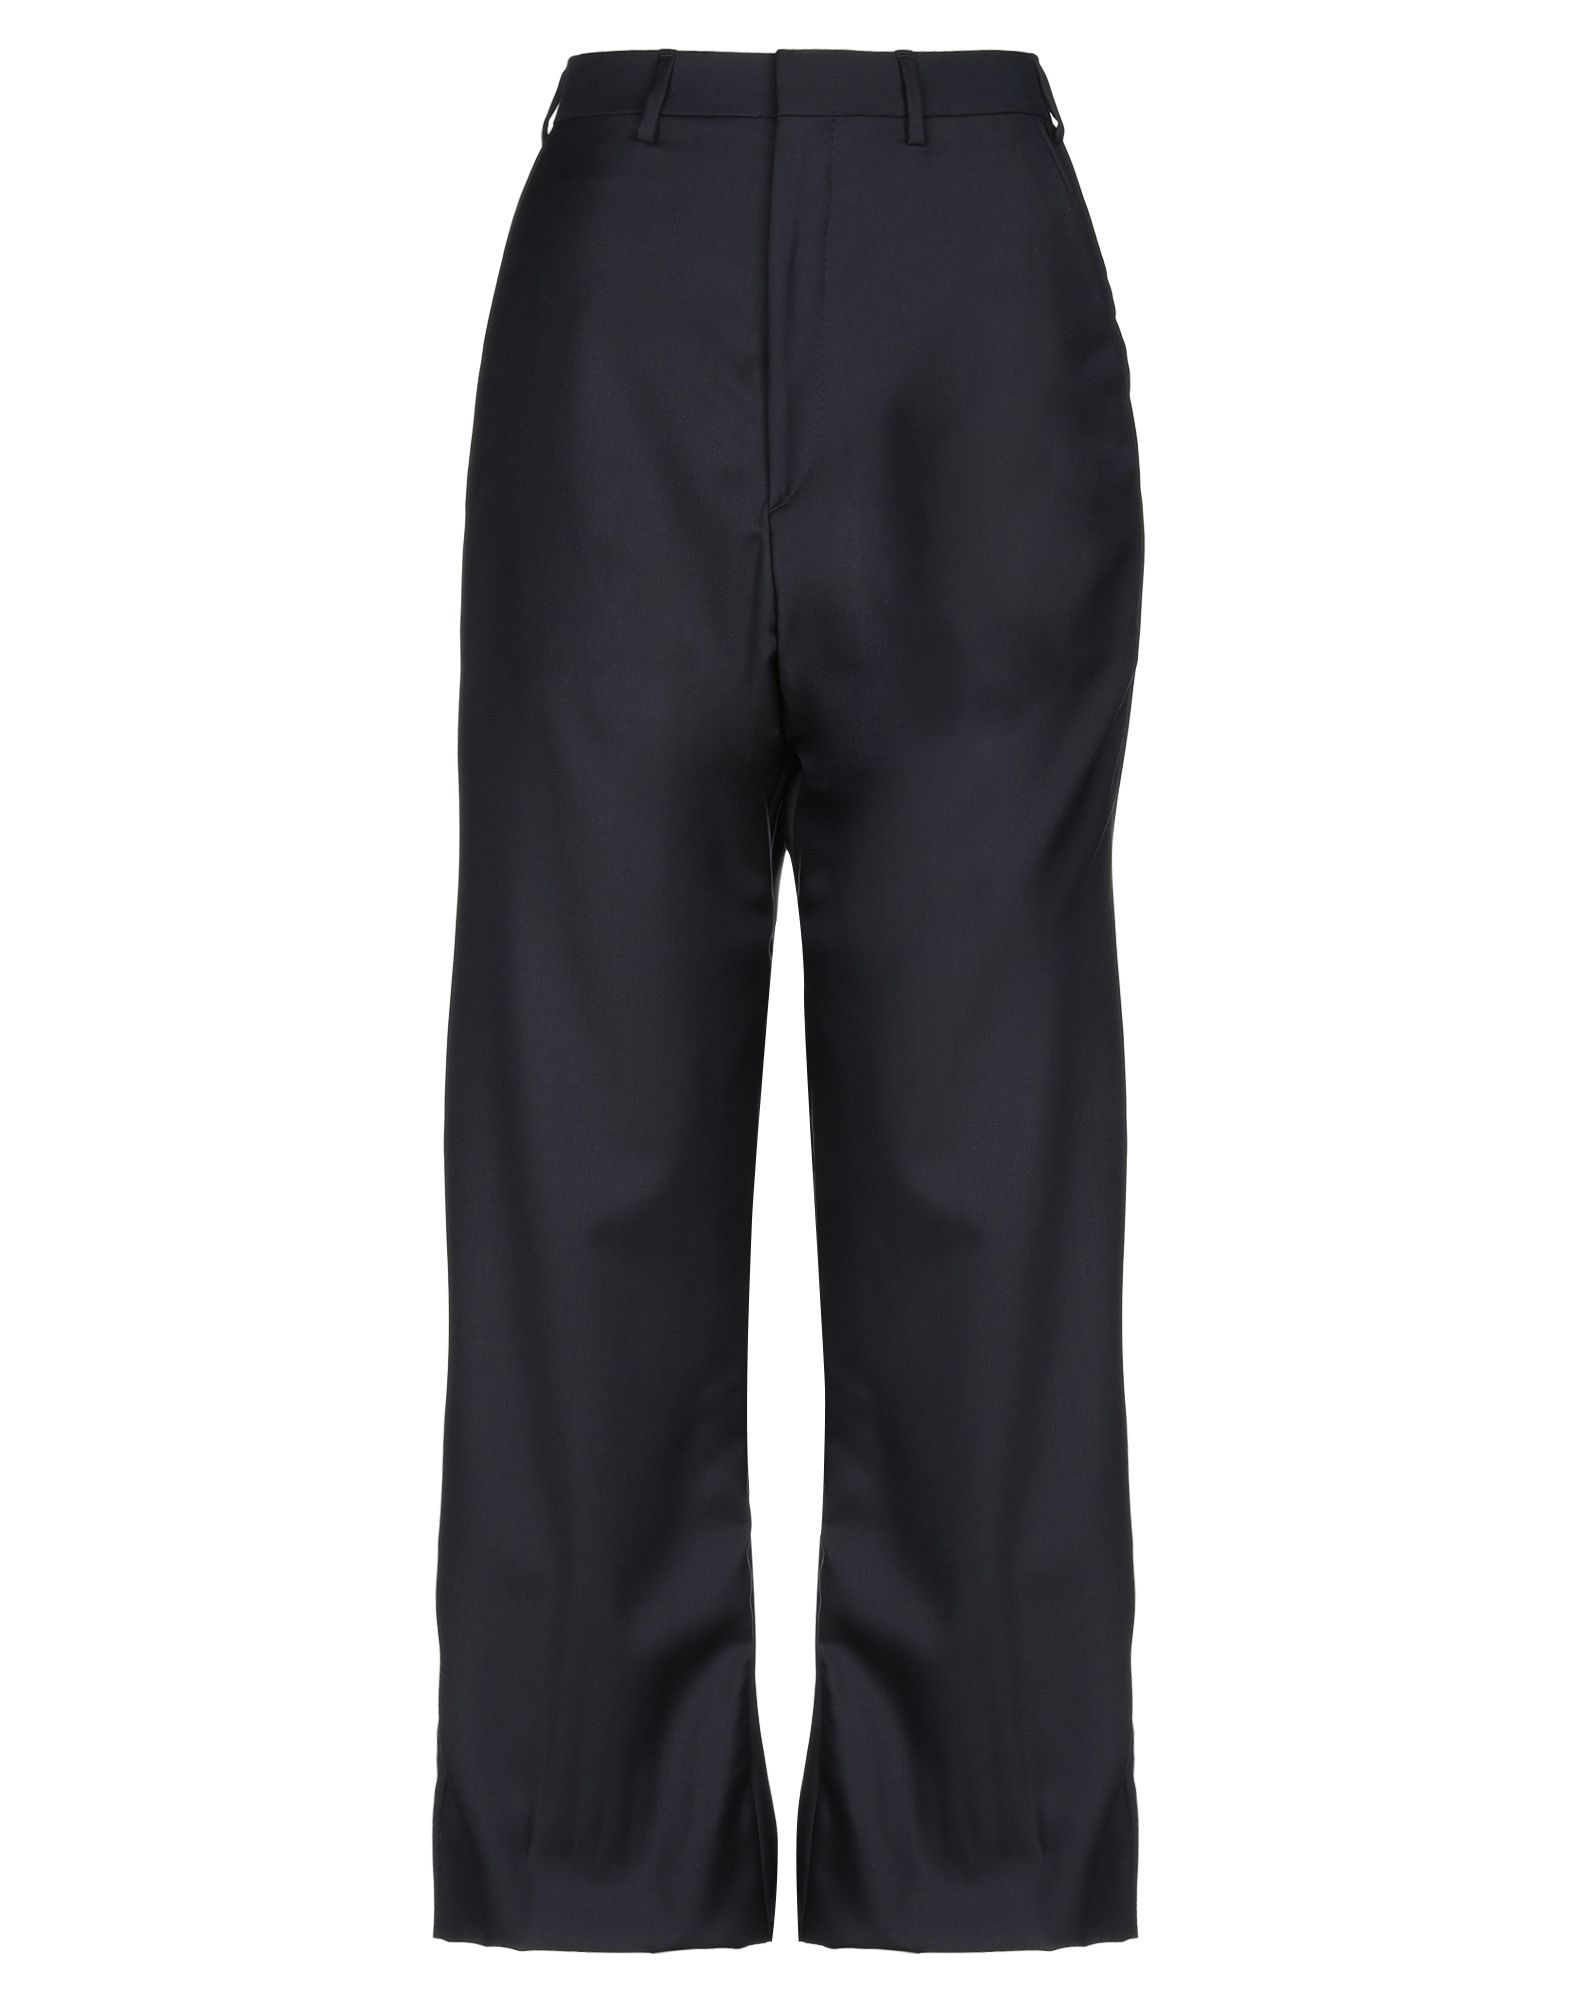 VETEMENTS x BRIONI Повседневные брюки brioni хлопкова�� рубашка